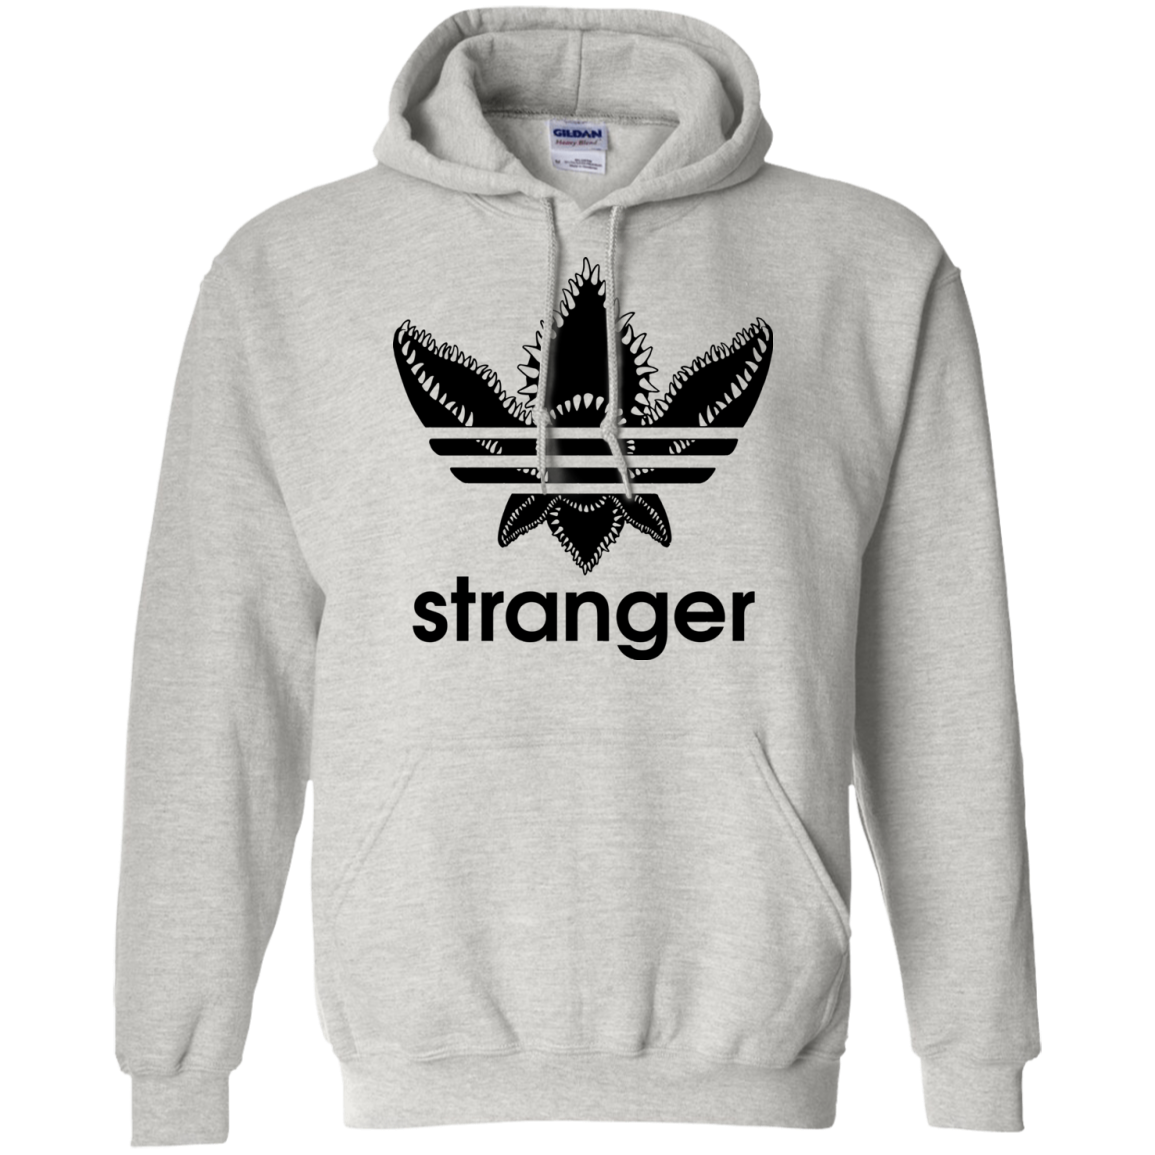 Stranger Things Stranger Demogorgon Adidas Shirt Hoodie Long Sleeve Stranger Things Hoodie Sweatshirts Pullover Sweatshirts [ 1155 x 1155 Pixel ]